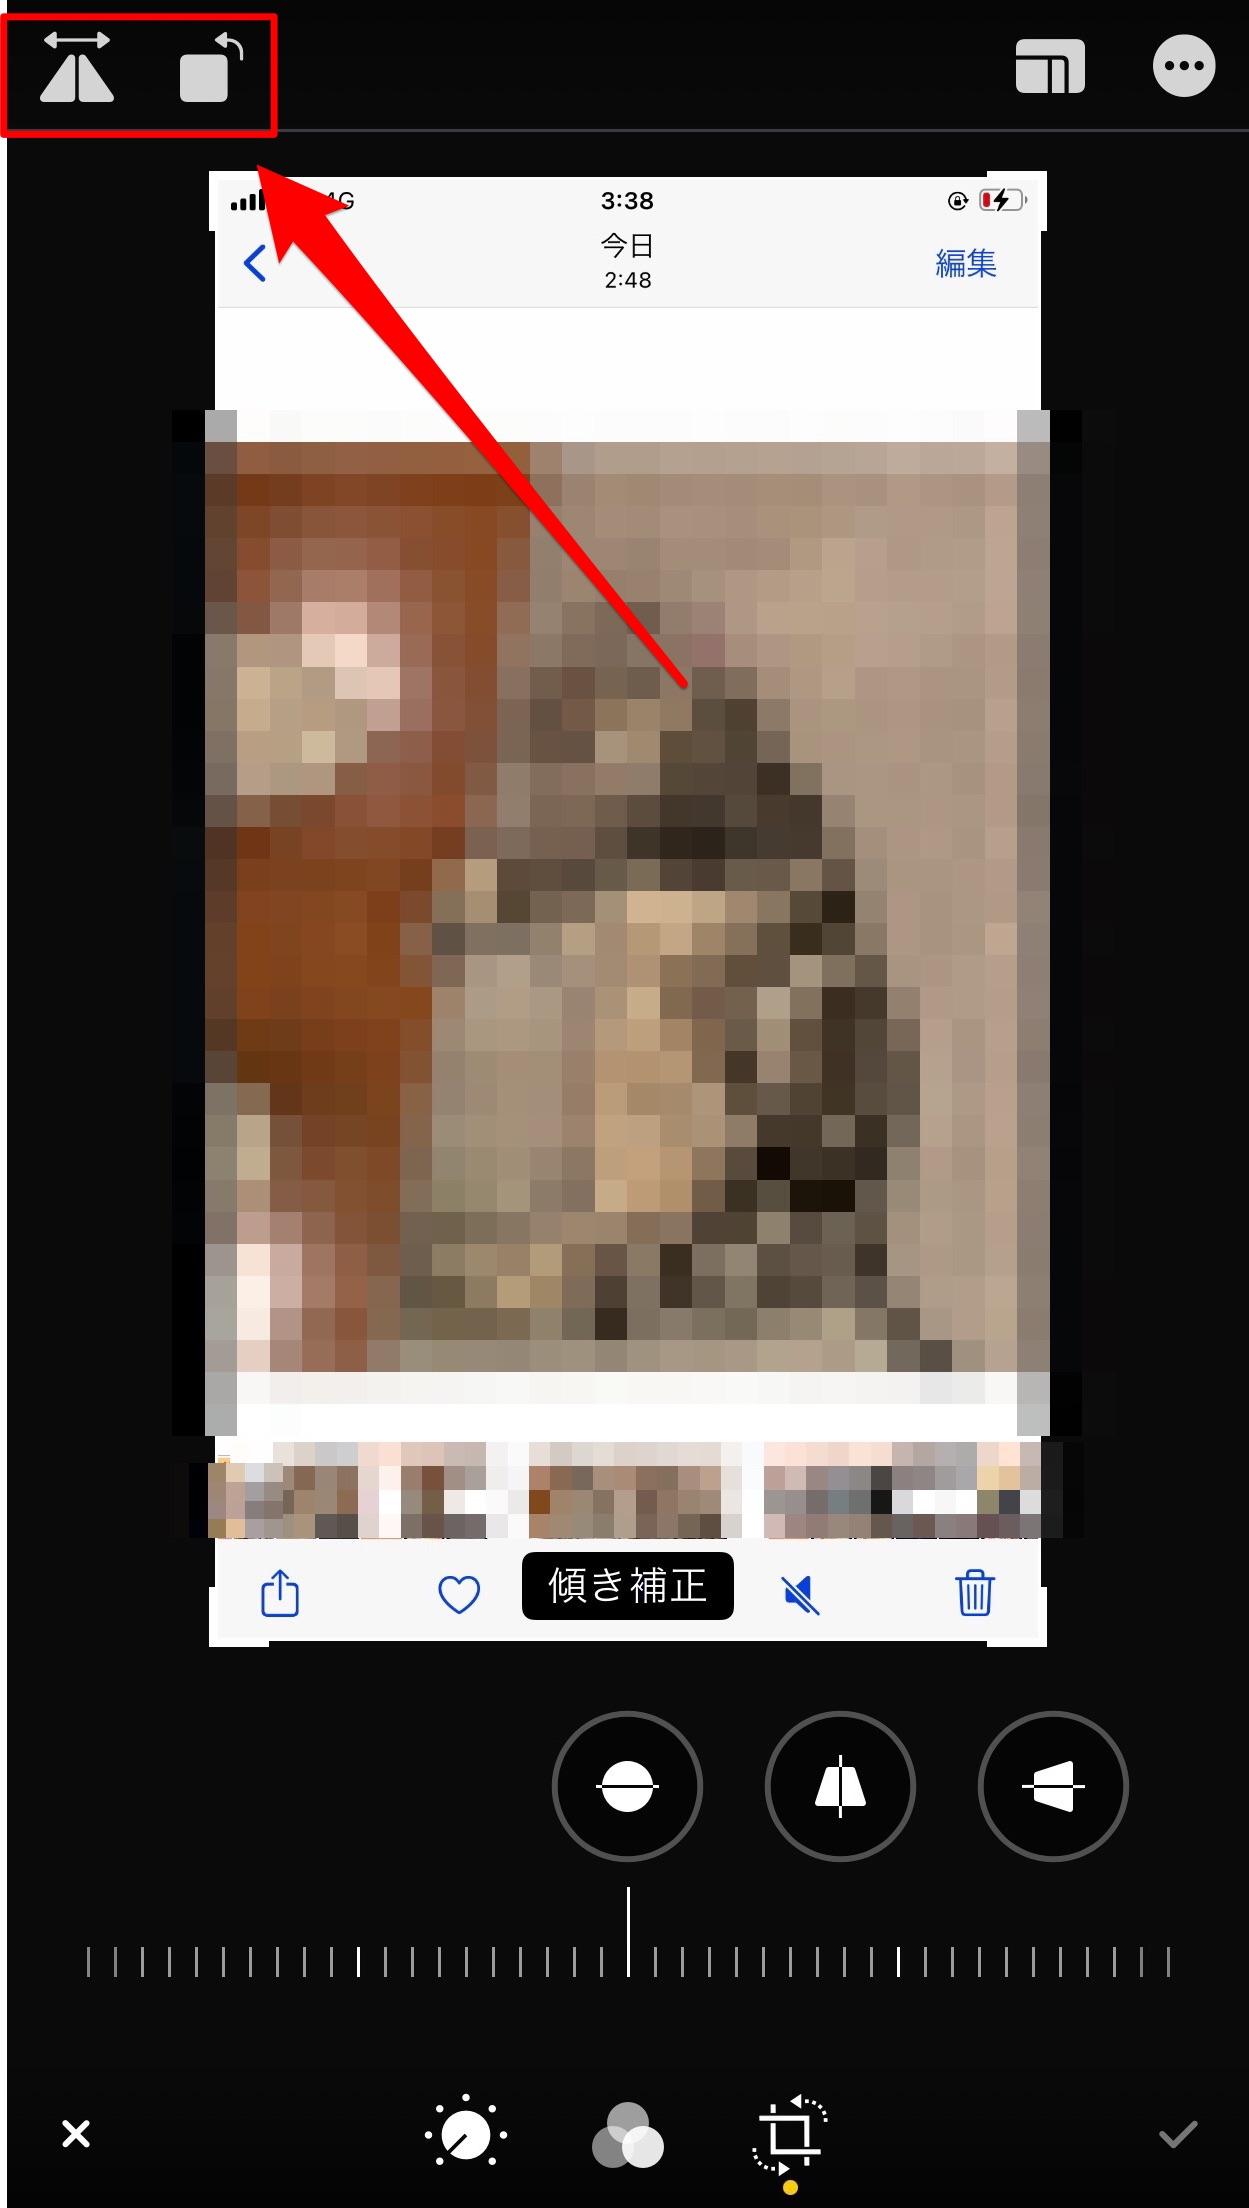 iPhoneの写真アプリを使う